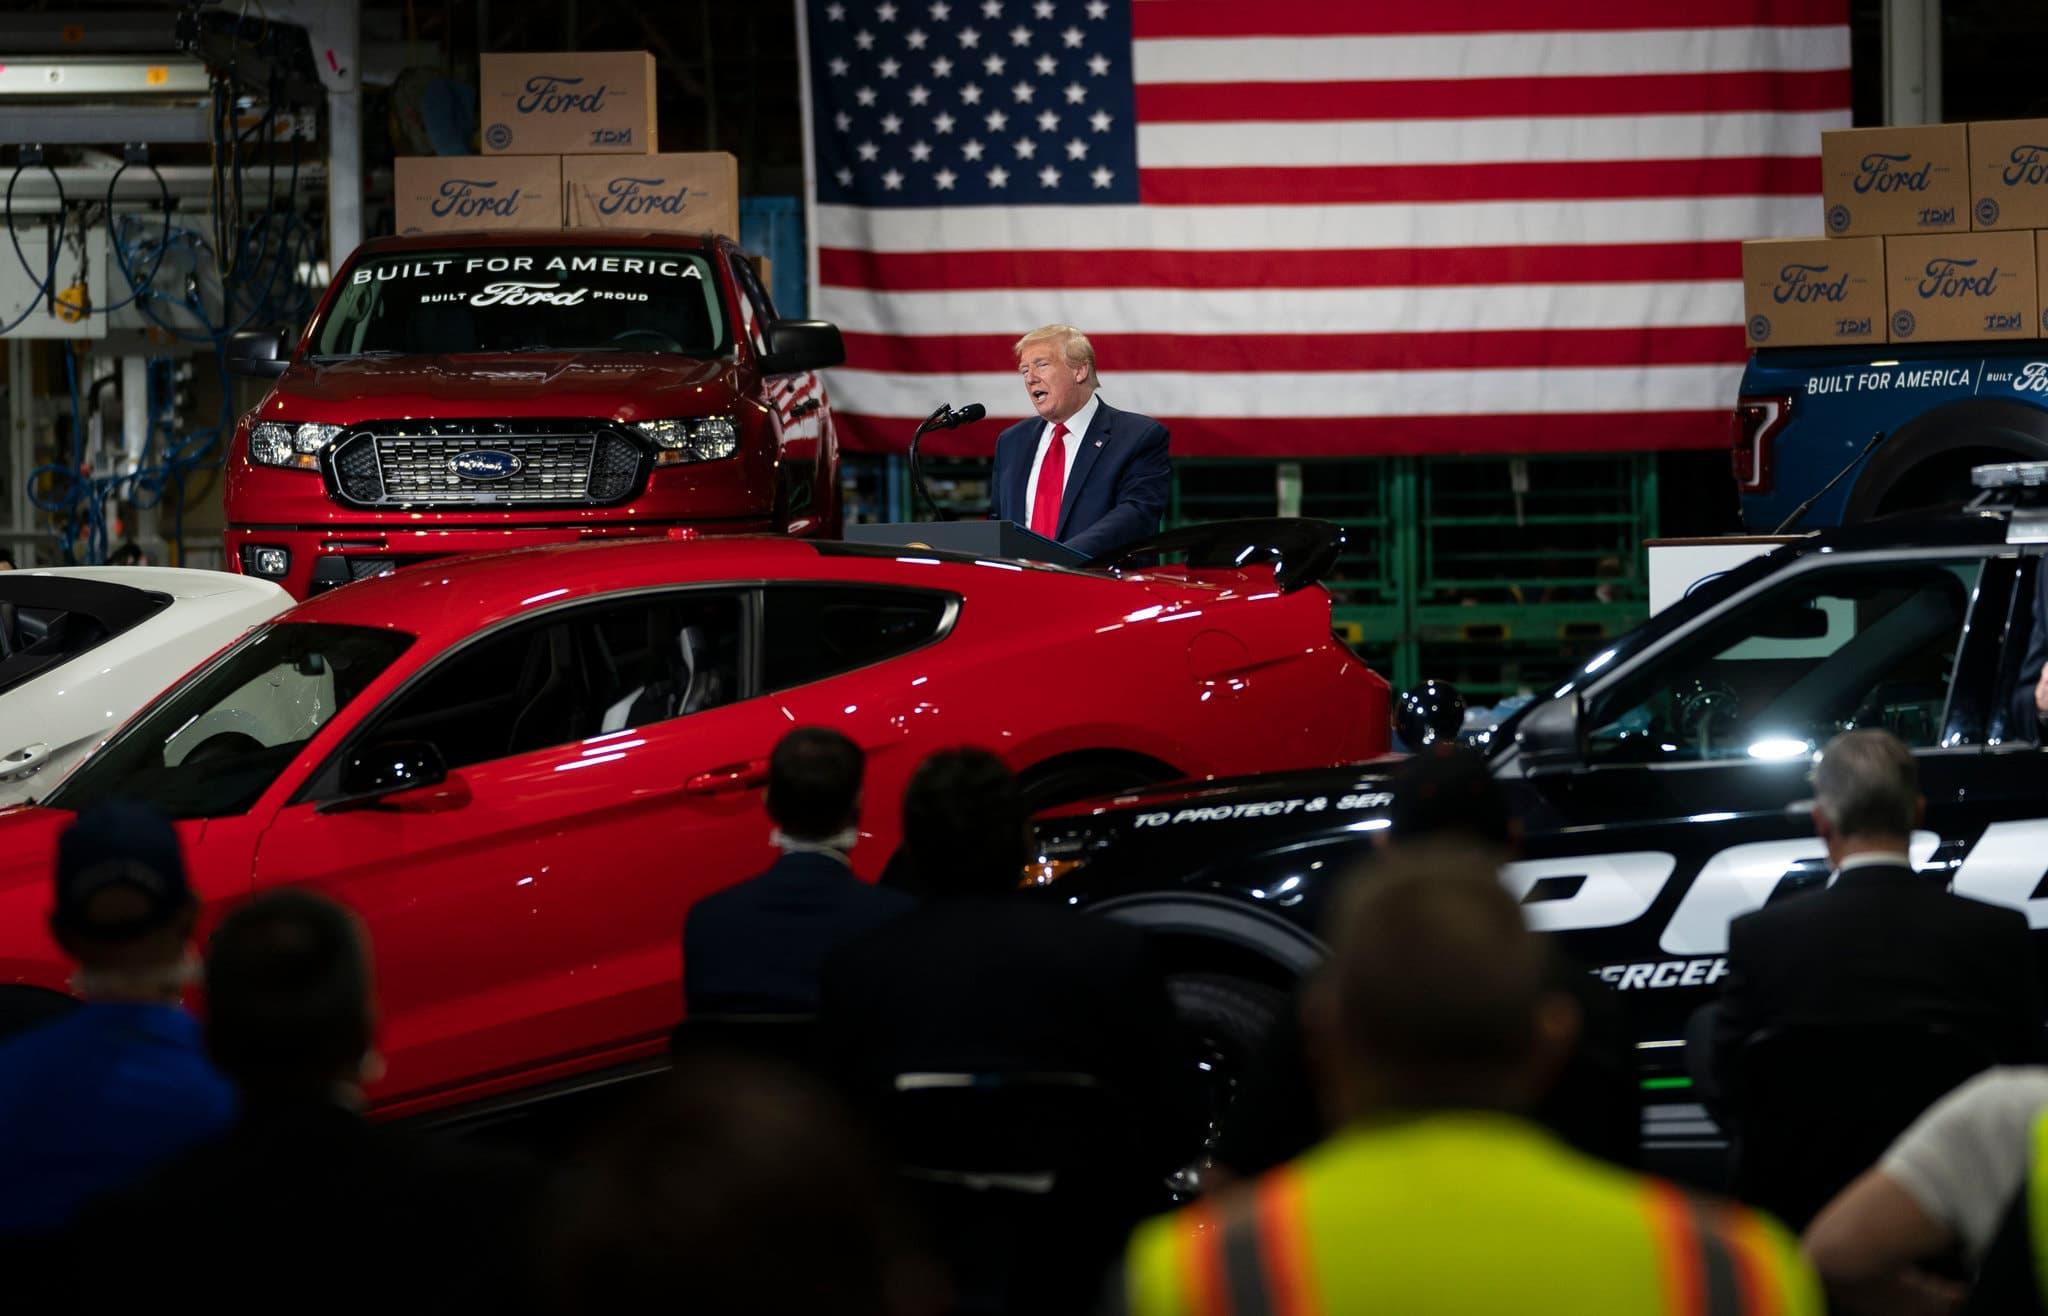 Donald Trump standing behind a sports car